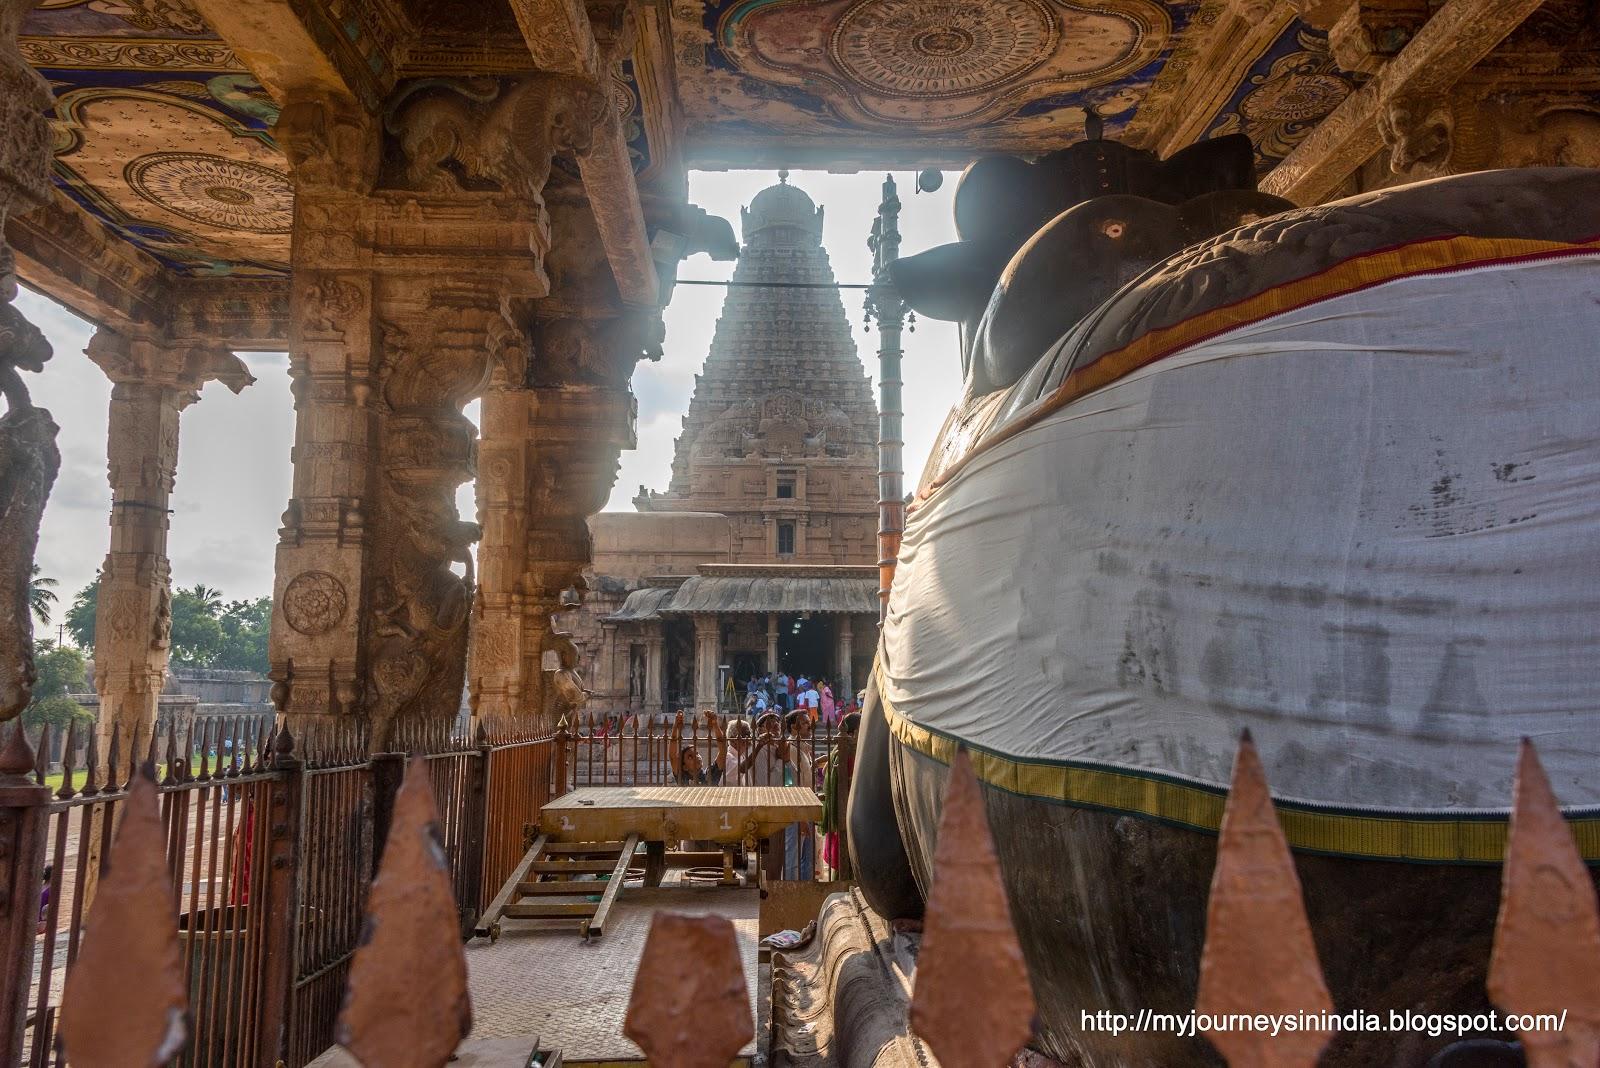 Thanjavur Brihadeeswarar Temple Big Nandi View